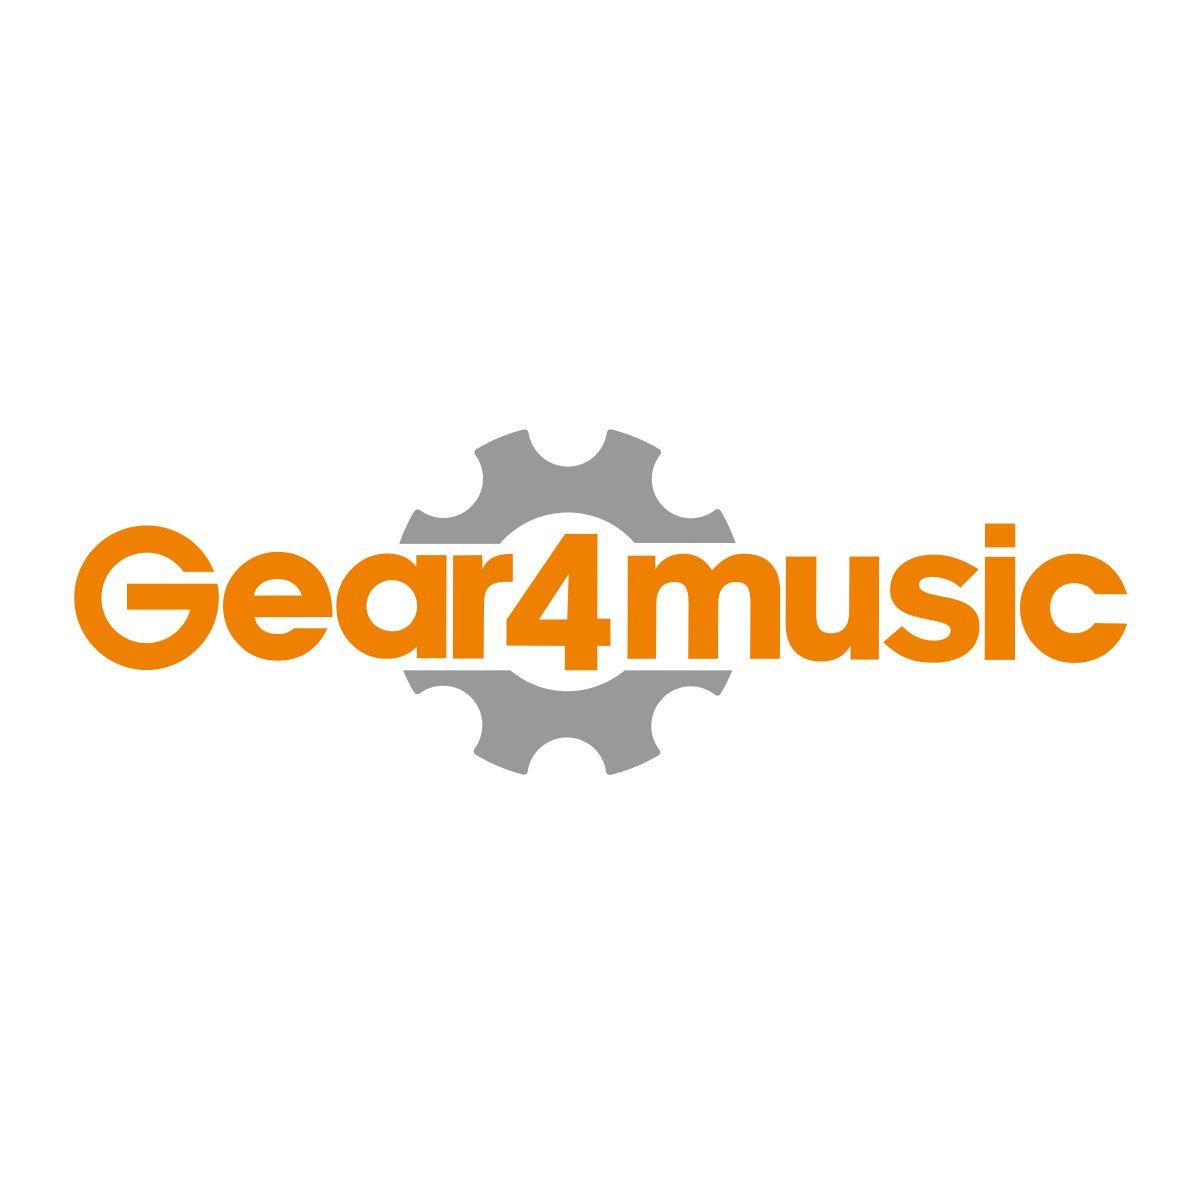 Deluxe Cutaway Folk Guitar Pack by Gear4music, Ovangkol